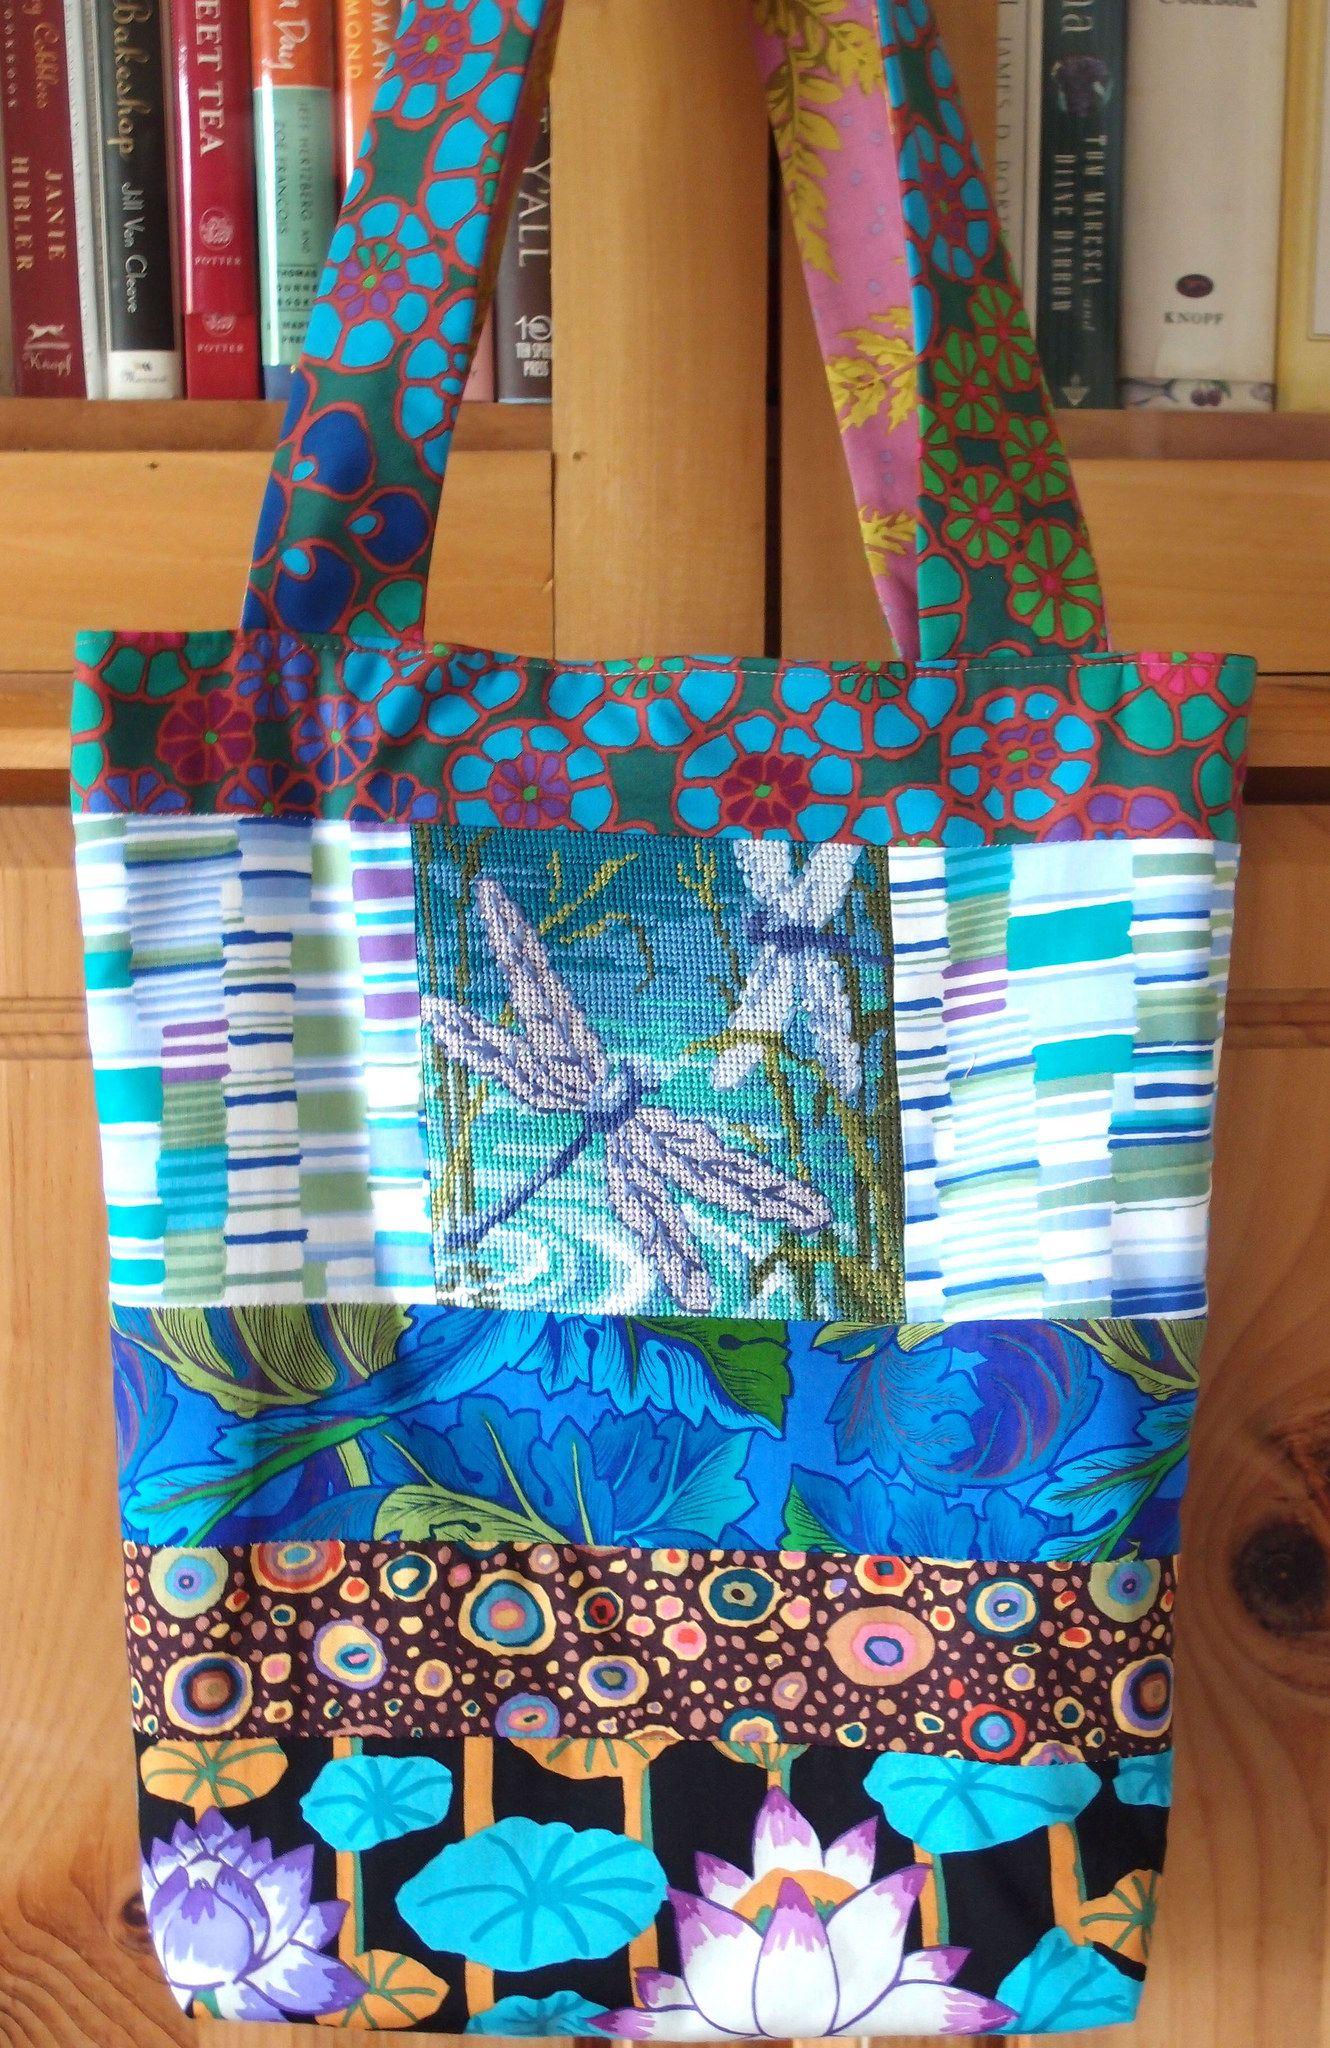 "https://flic.kr/p/nFWRMJ | 765P6138679 | Anna's Knitting Bag No. 766 Customer's Needlepoint Kaffe Fassett ""Tile Flowers"" Kaffe Fassett ""Shirt Stripes"" Kaffe Fassett ""Dancing Leaves"" Kaffe Fassett ""Roman Glass"" Kaffe Fassett ""Lotus Stripe"" Martha Negley ""Fern"""